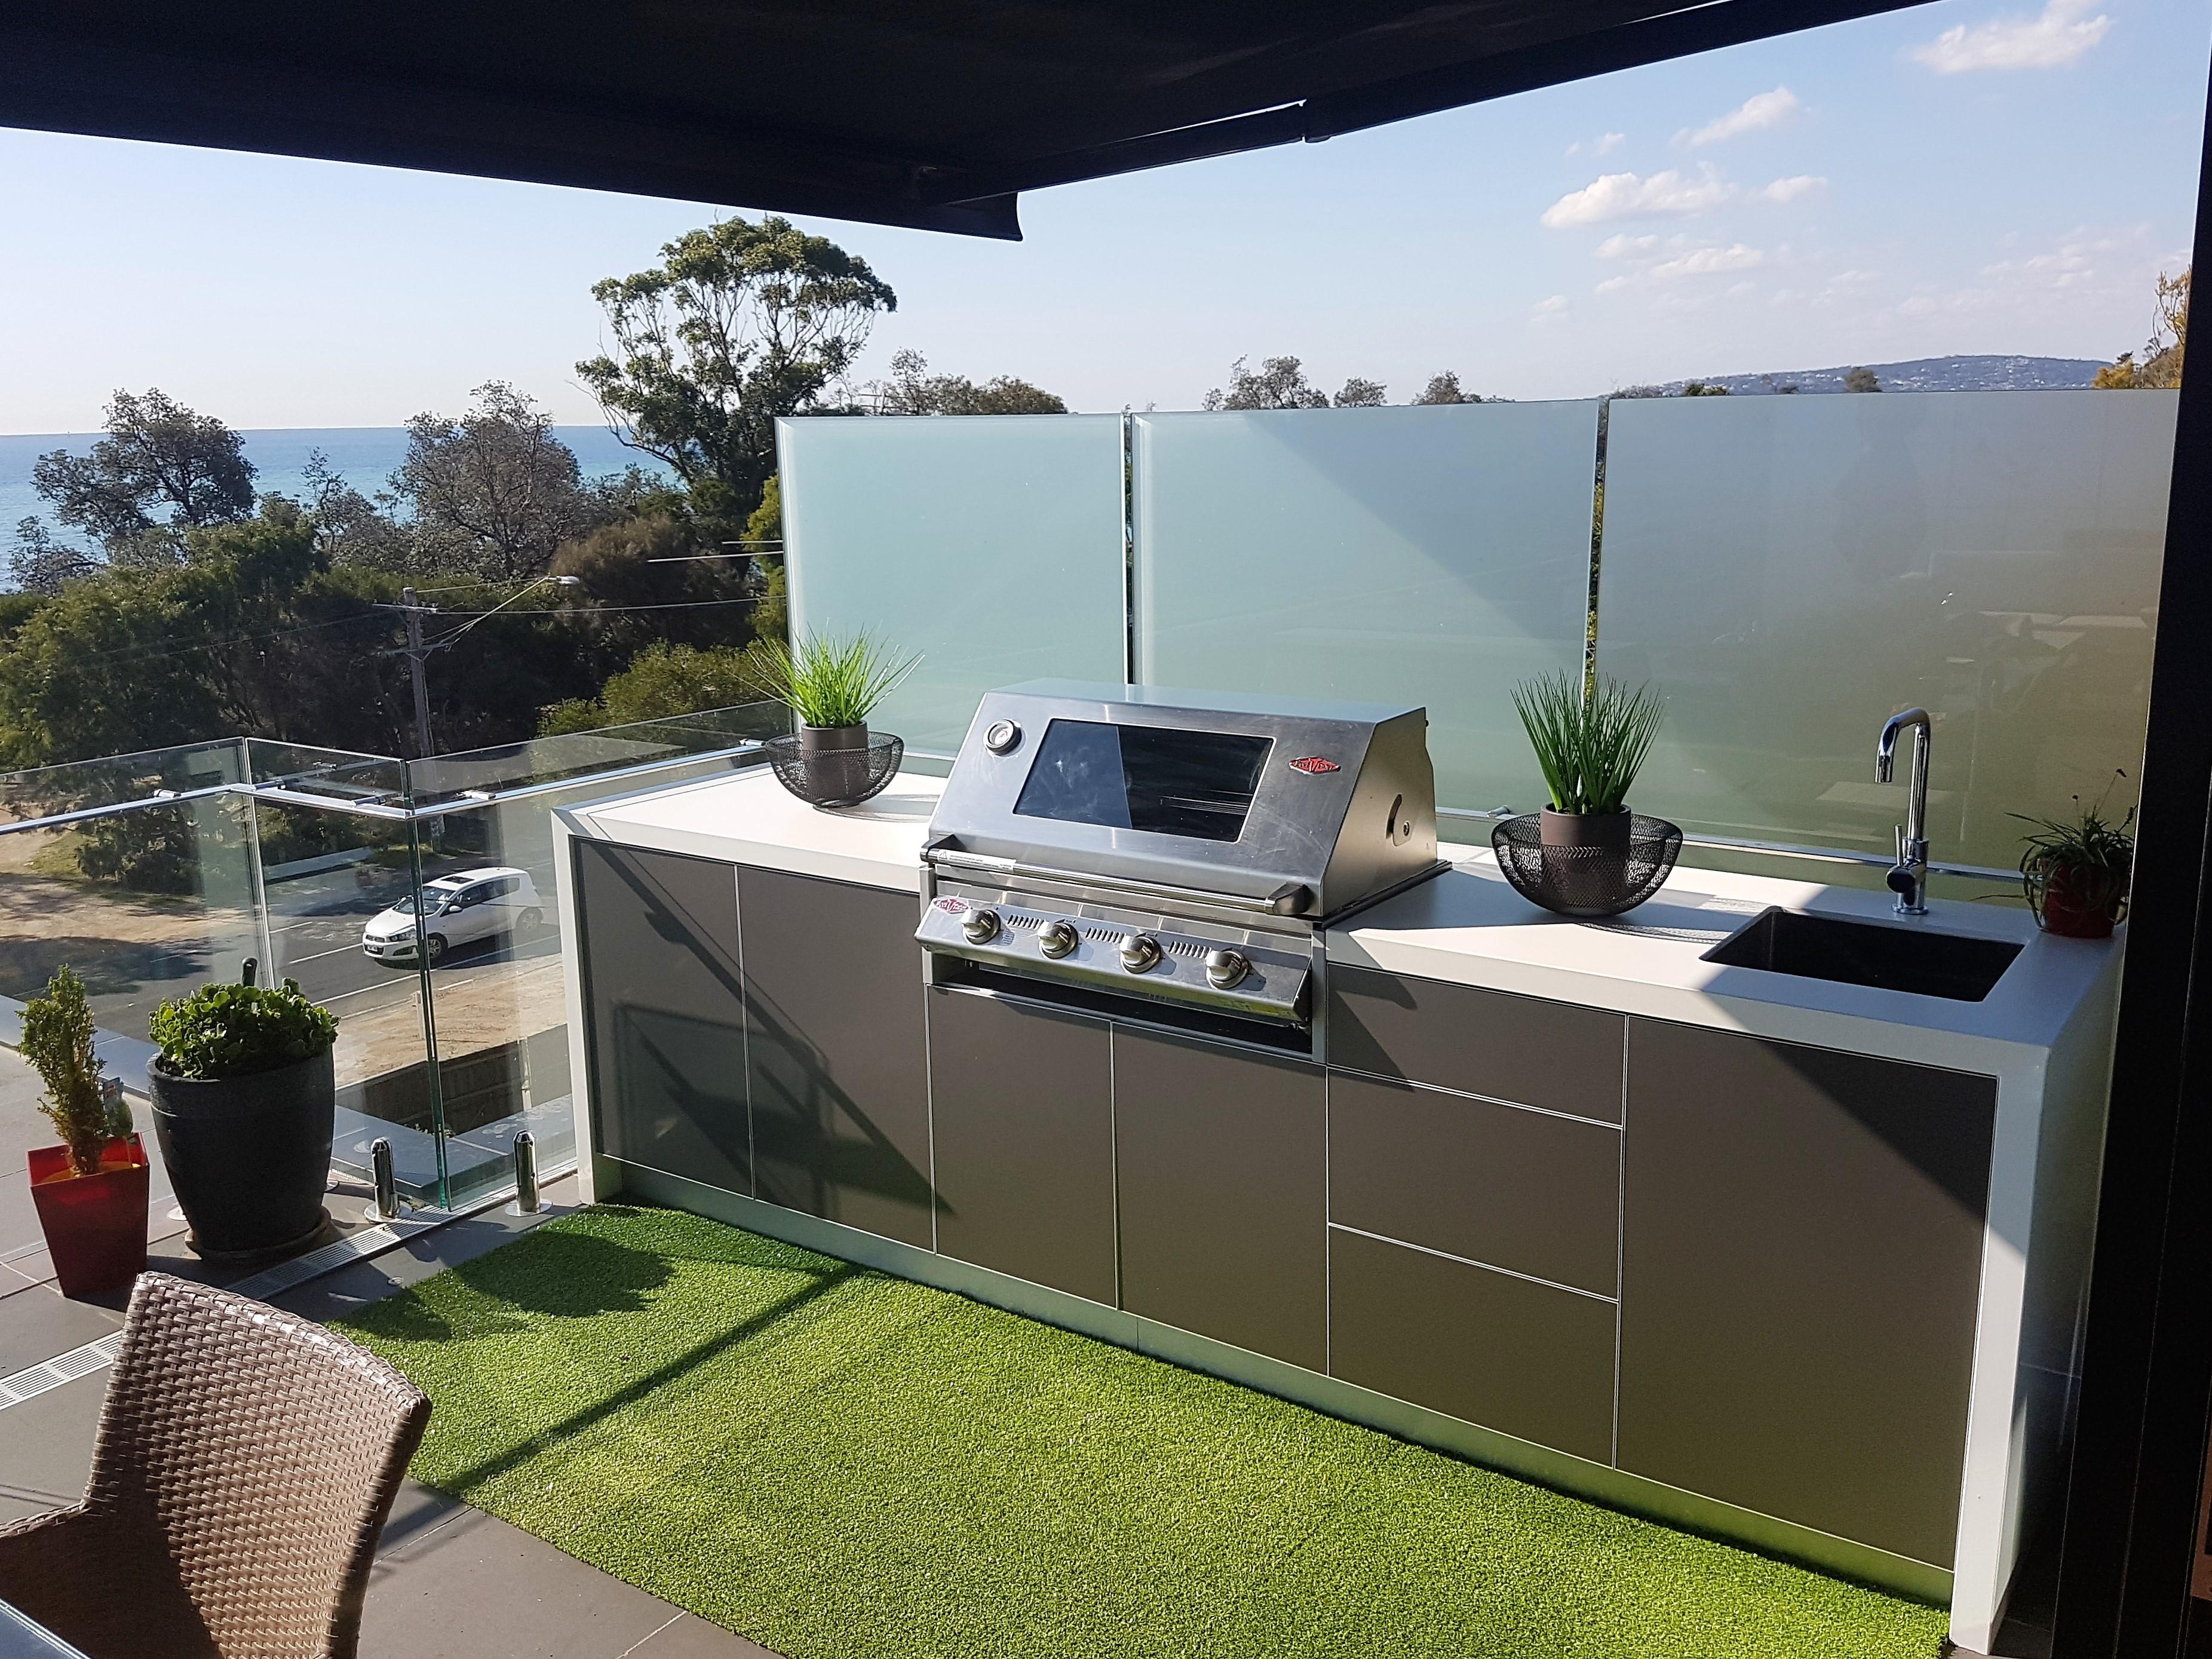 Outdoor Kitchen Mornington Peninsula Melbourne.jpg